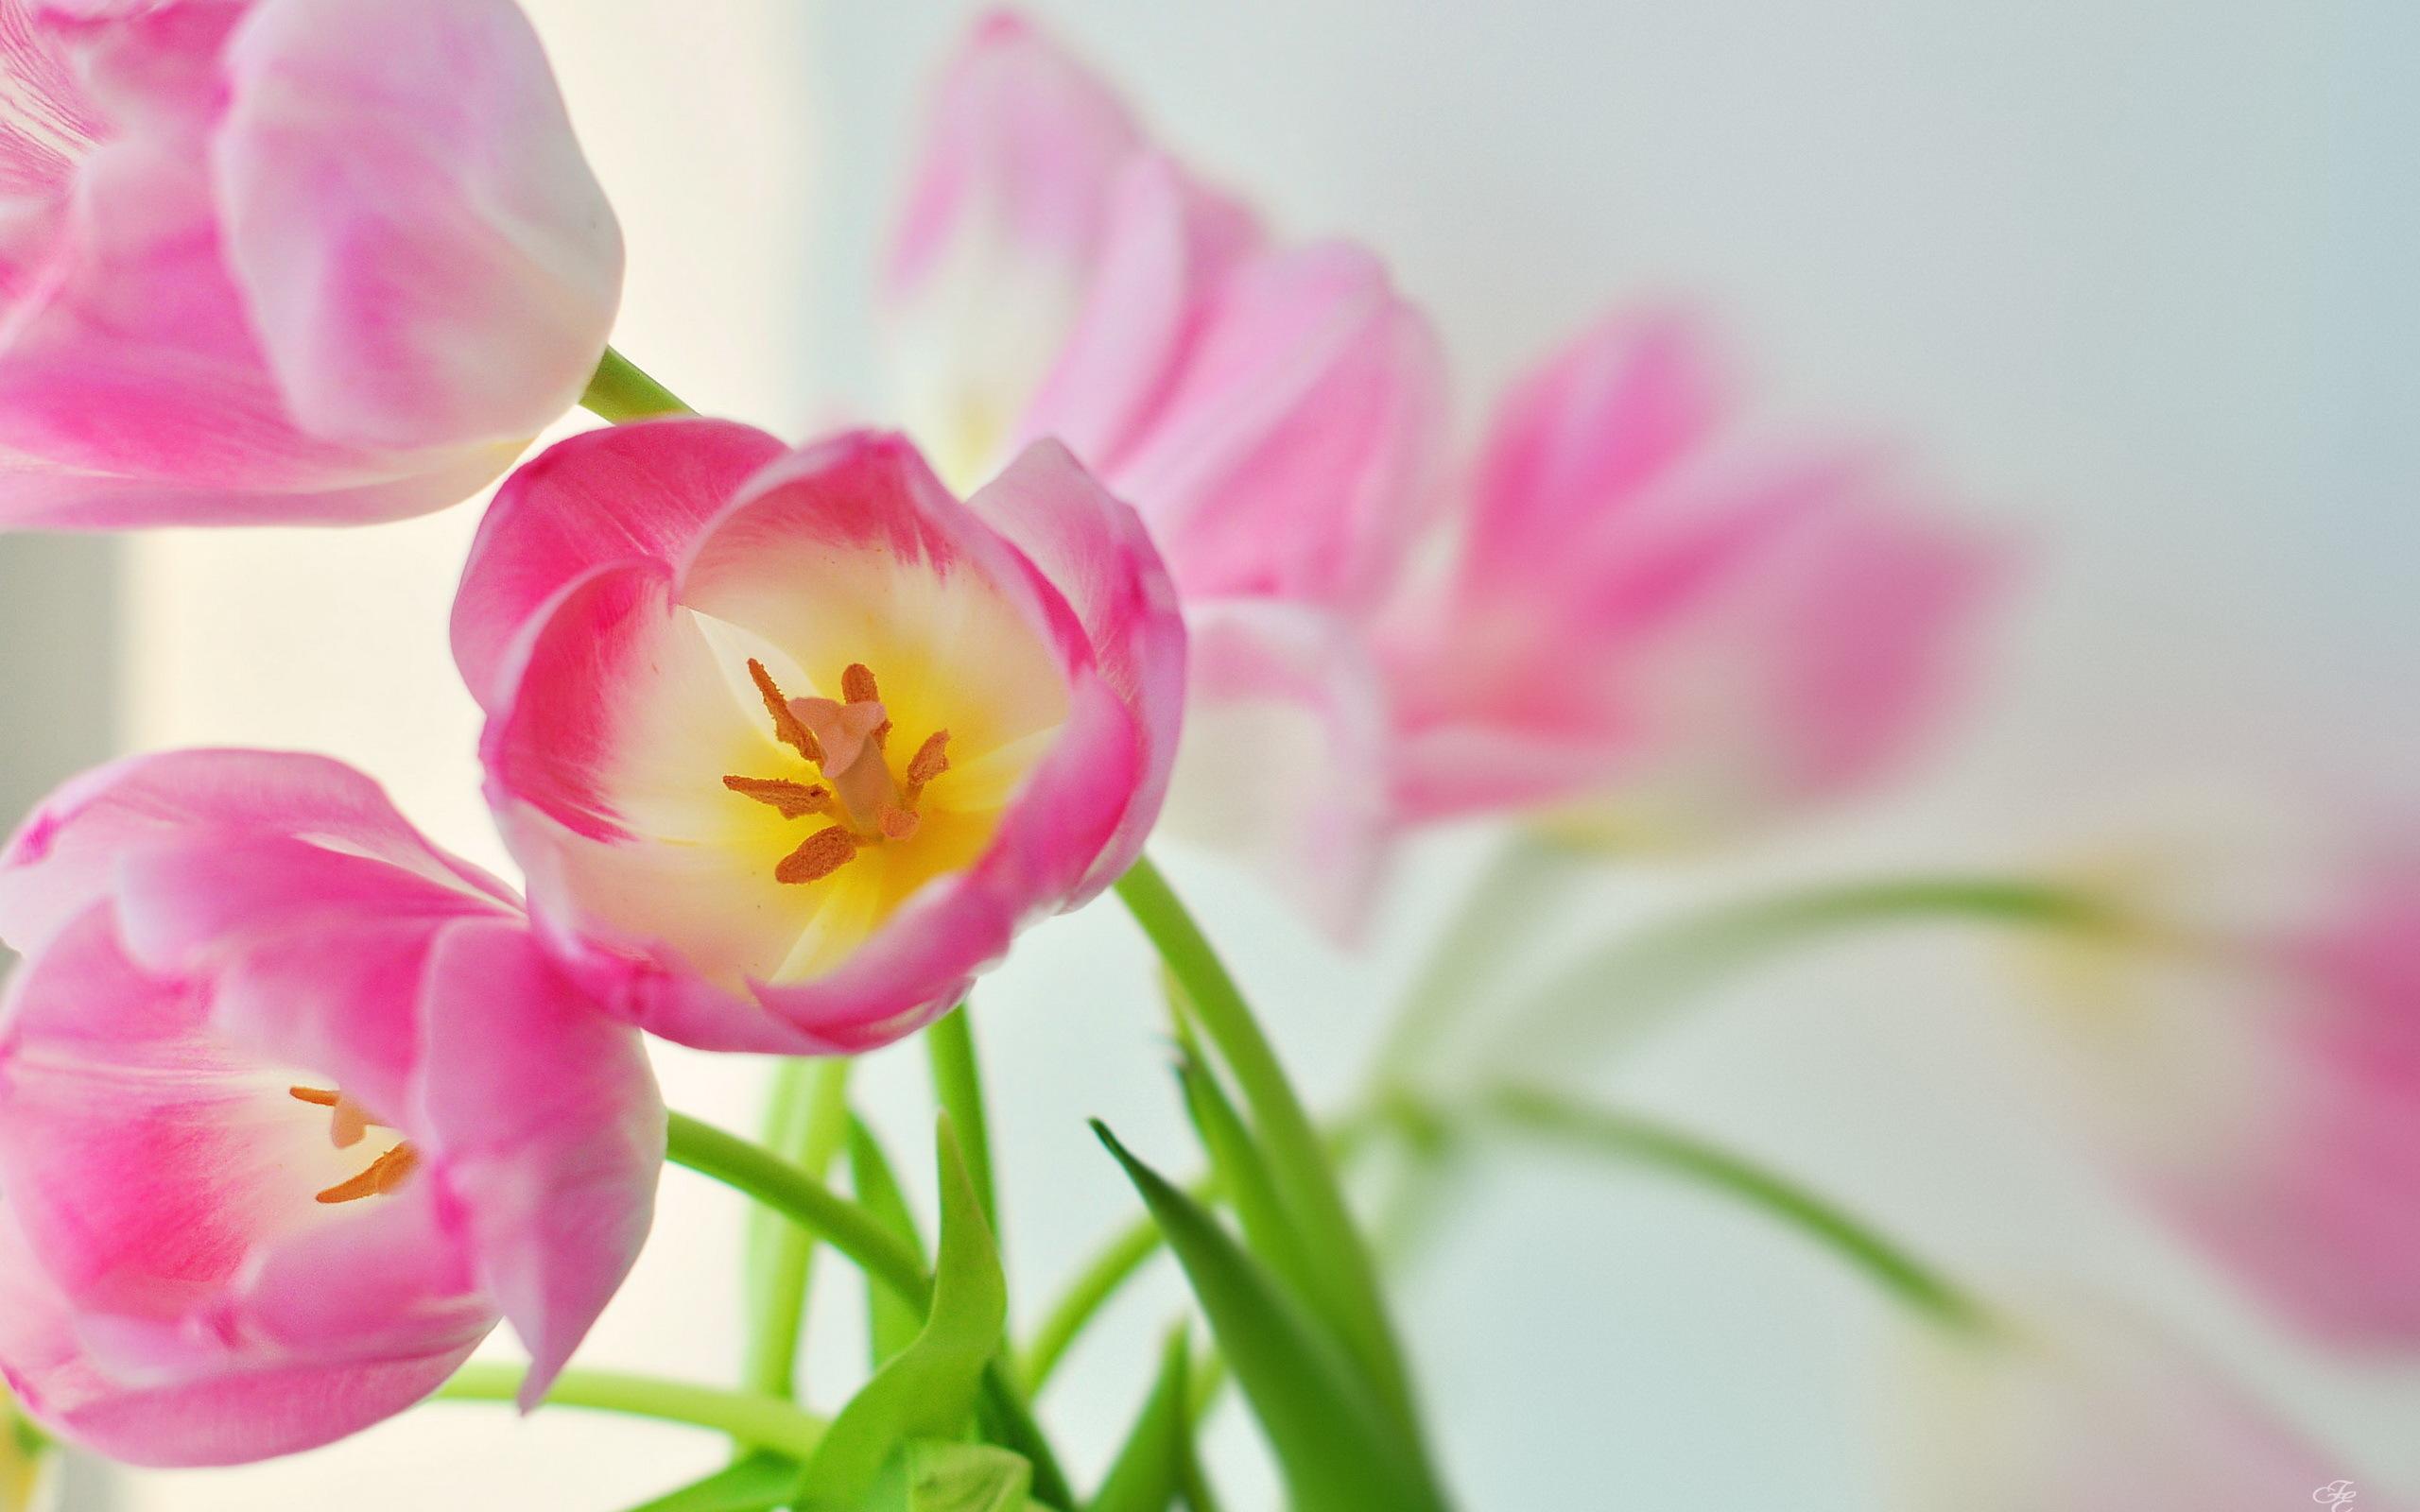 Hd Tulip Wallpaper - HD Desktop Wallpapers